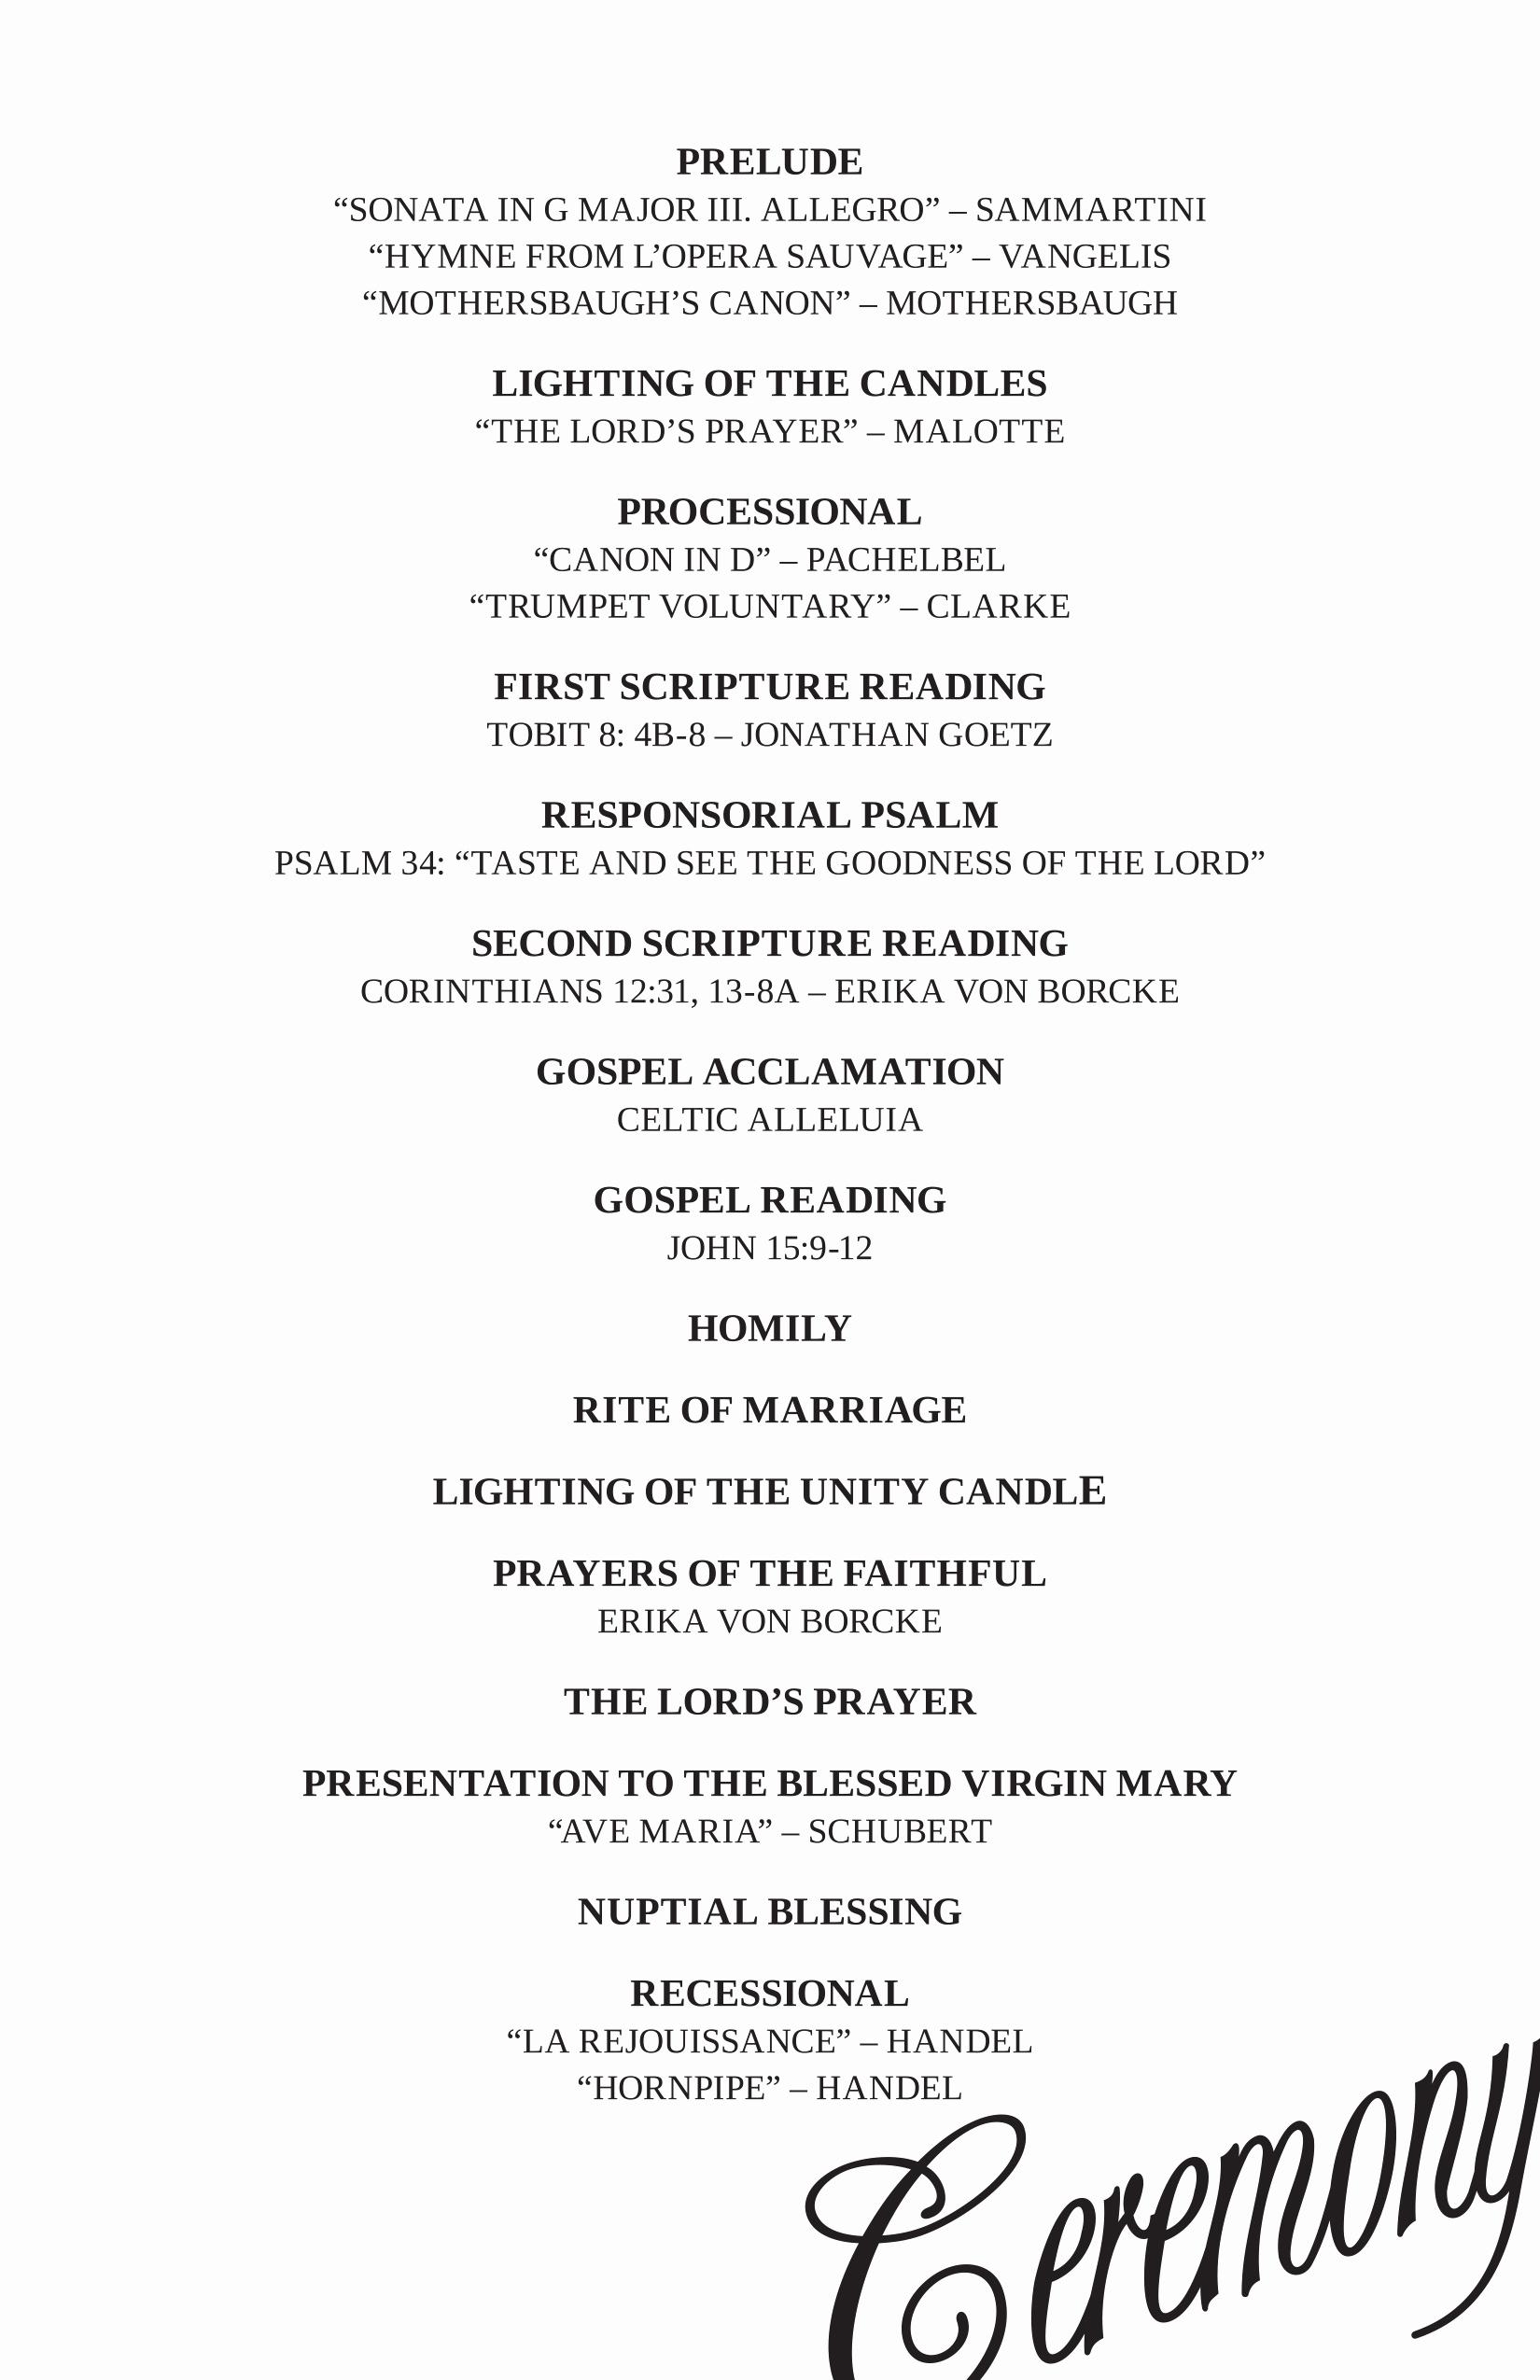 Wedding Reception Program Template Best Of Wedding Reception Program Ideas Wedding Decor Ideas